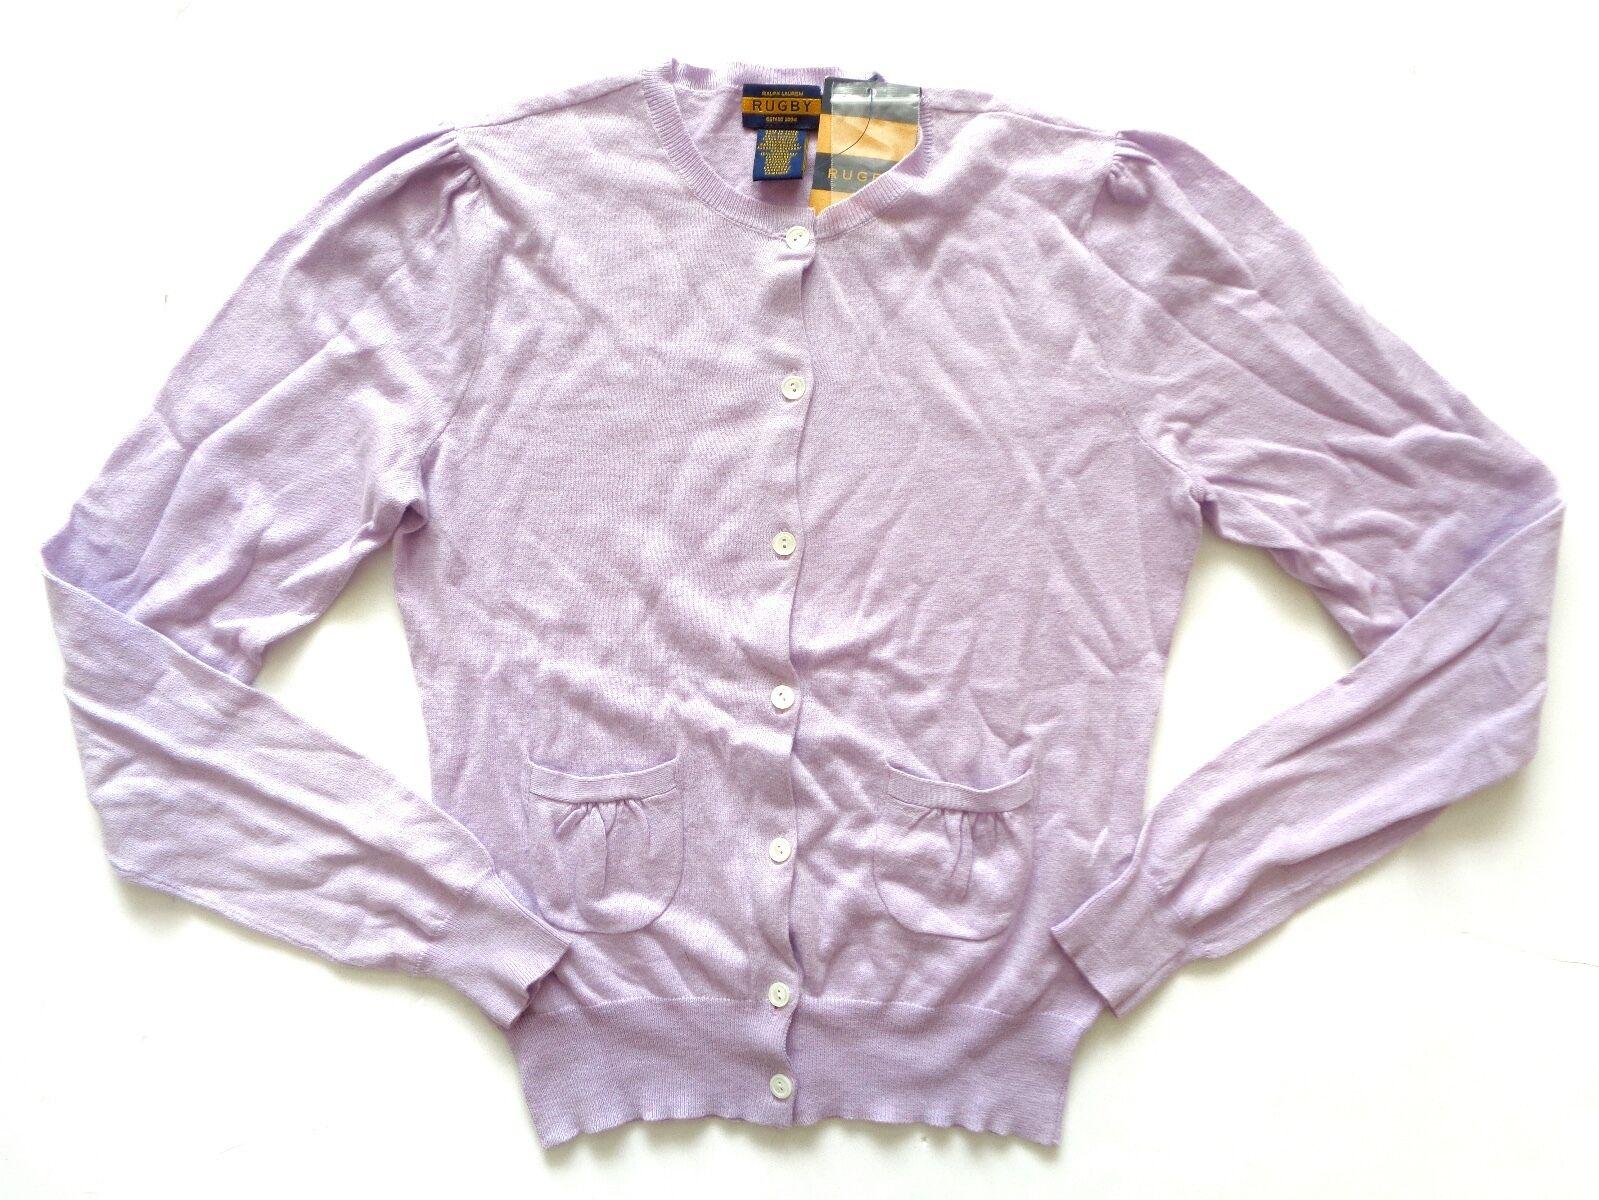 New Ralph Lauren Rugby Women's Cotton & Cashmere Cashmere Cashmere Purple Cardigan Sweater SLIM S 0eb08f